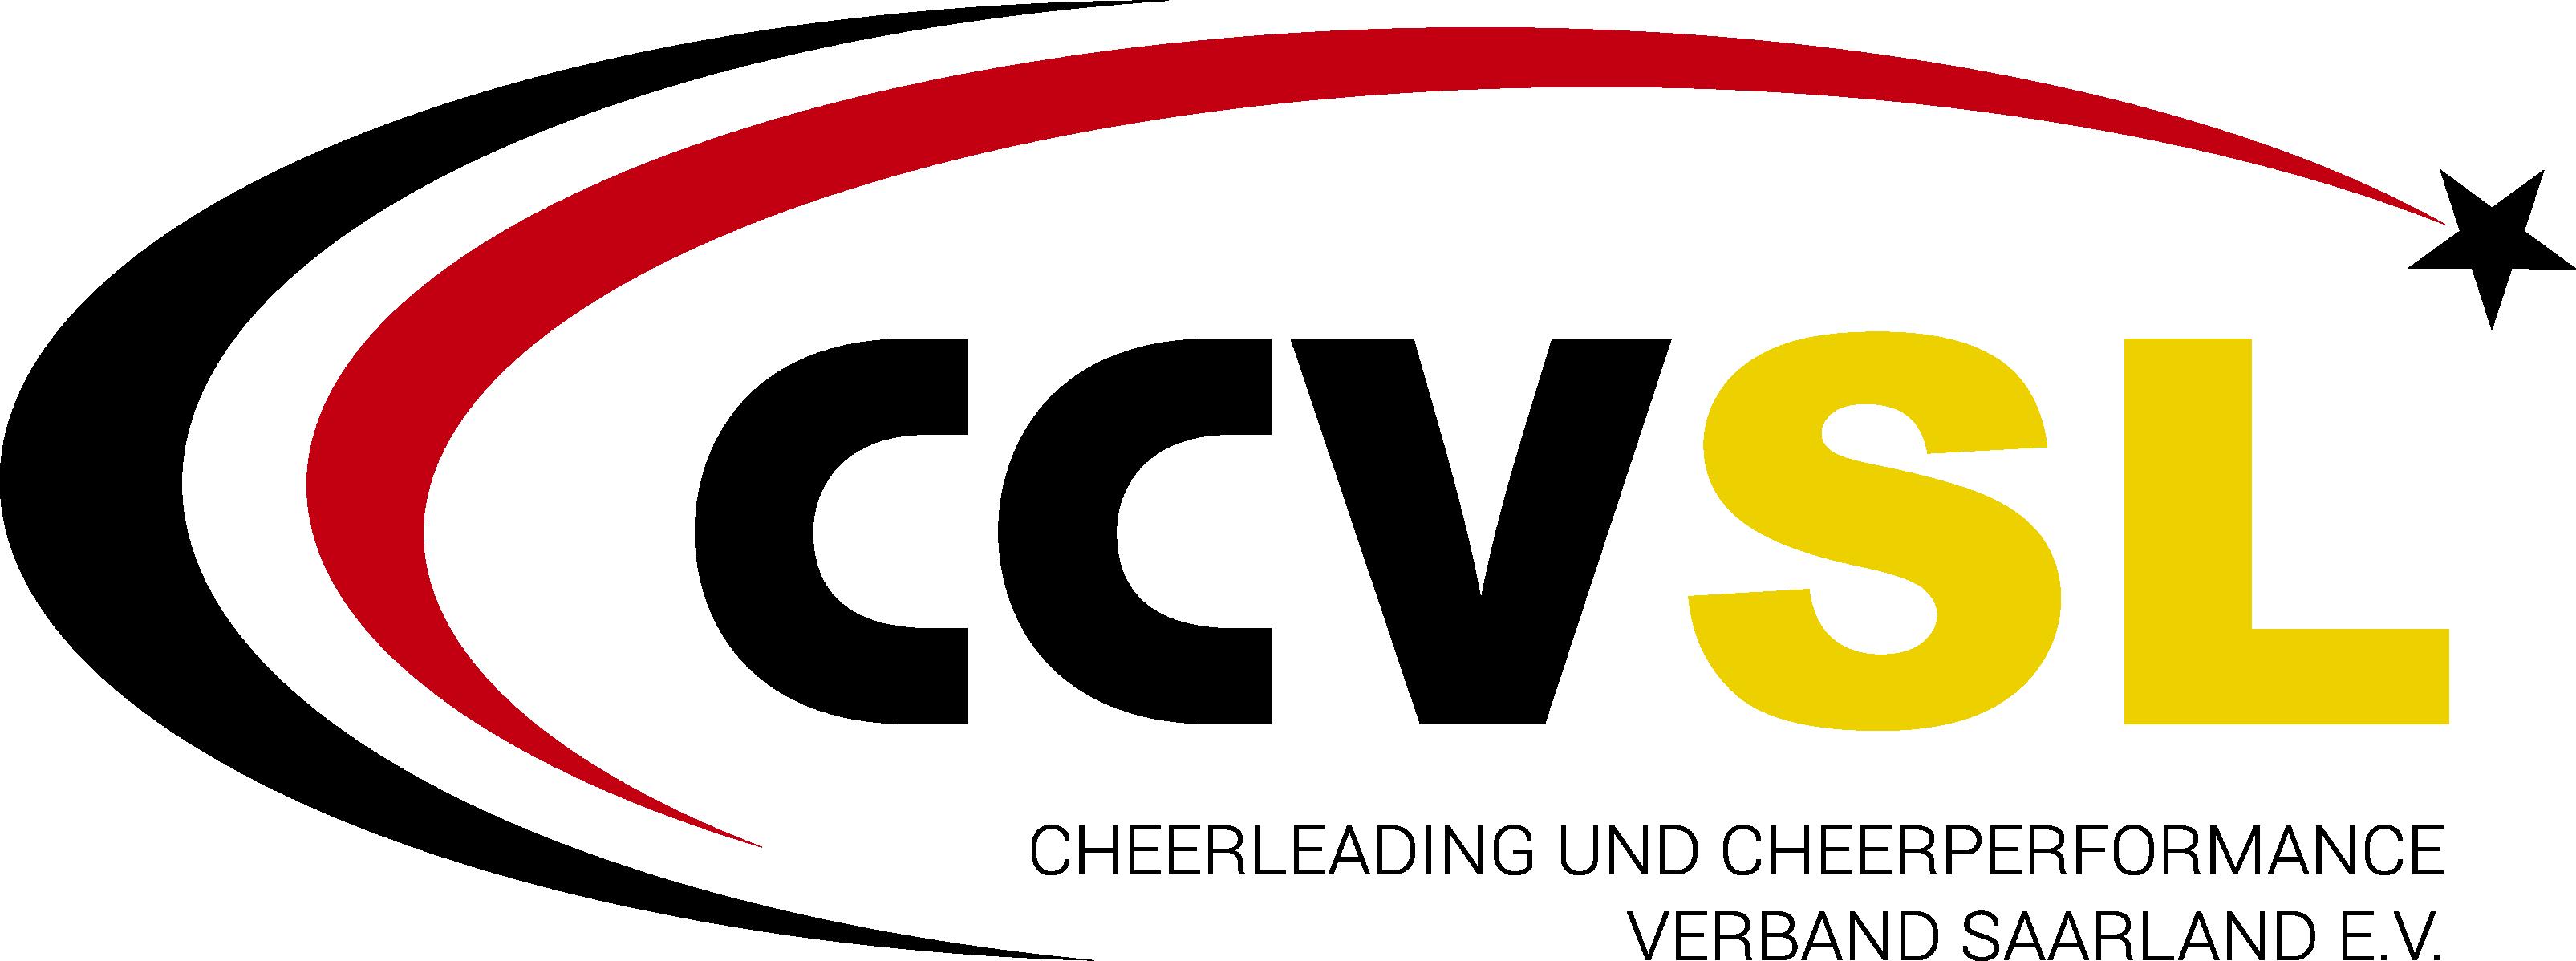 Cheerleading und Cheerdance Verband Saarland e. V.